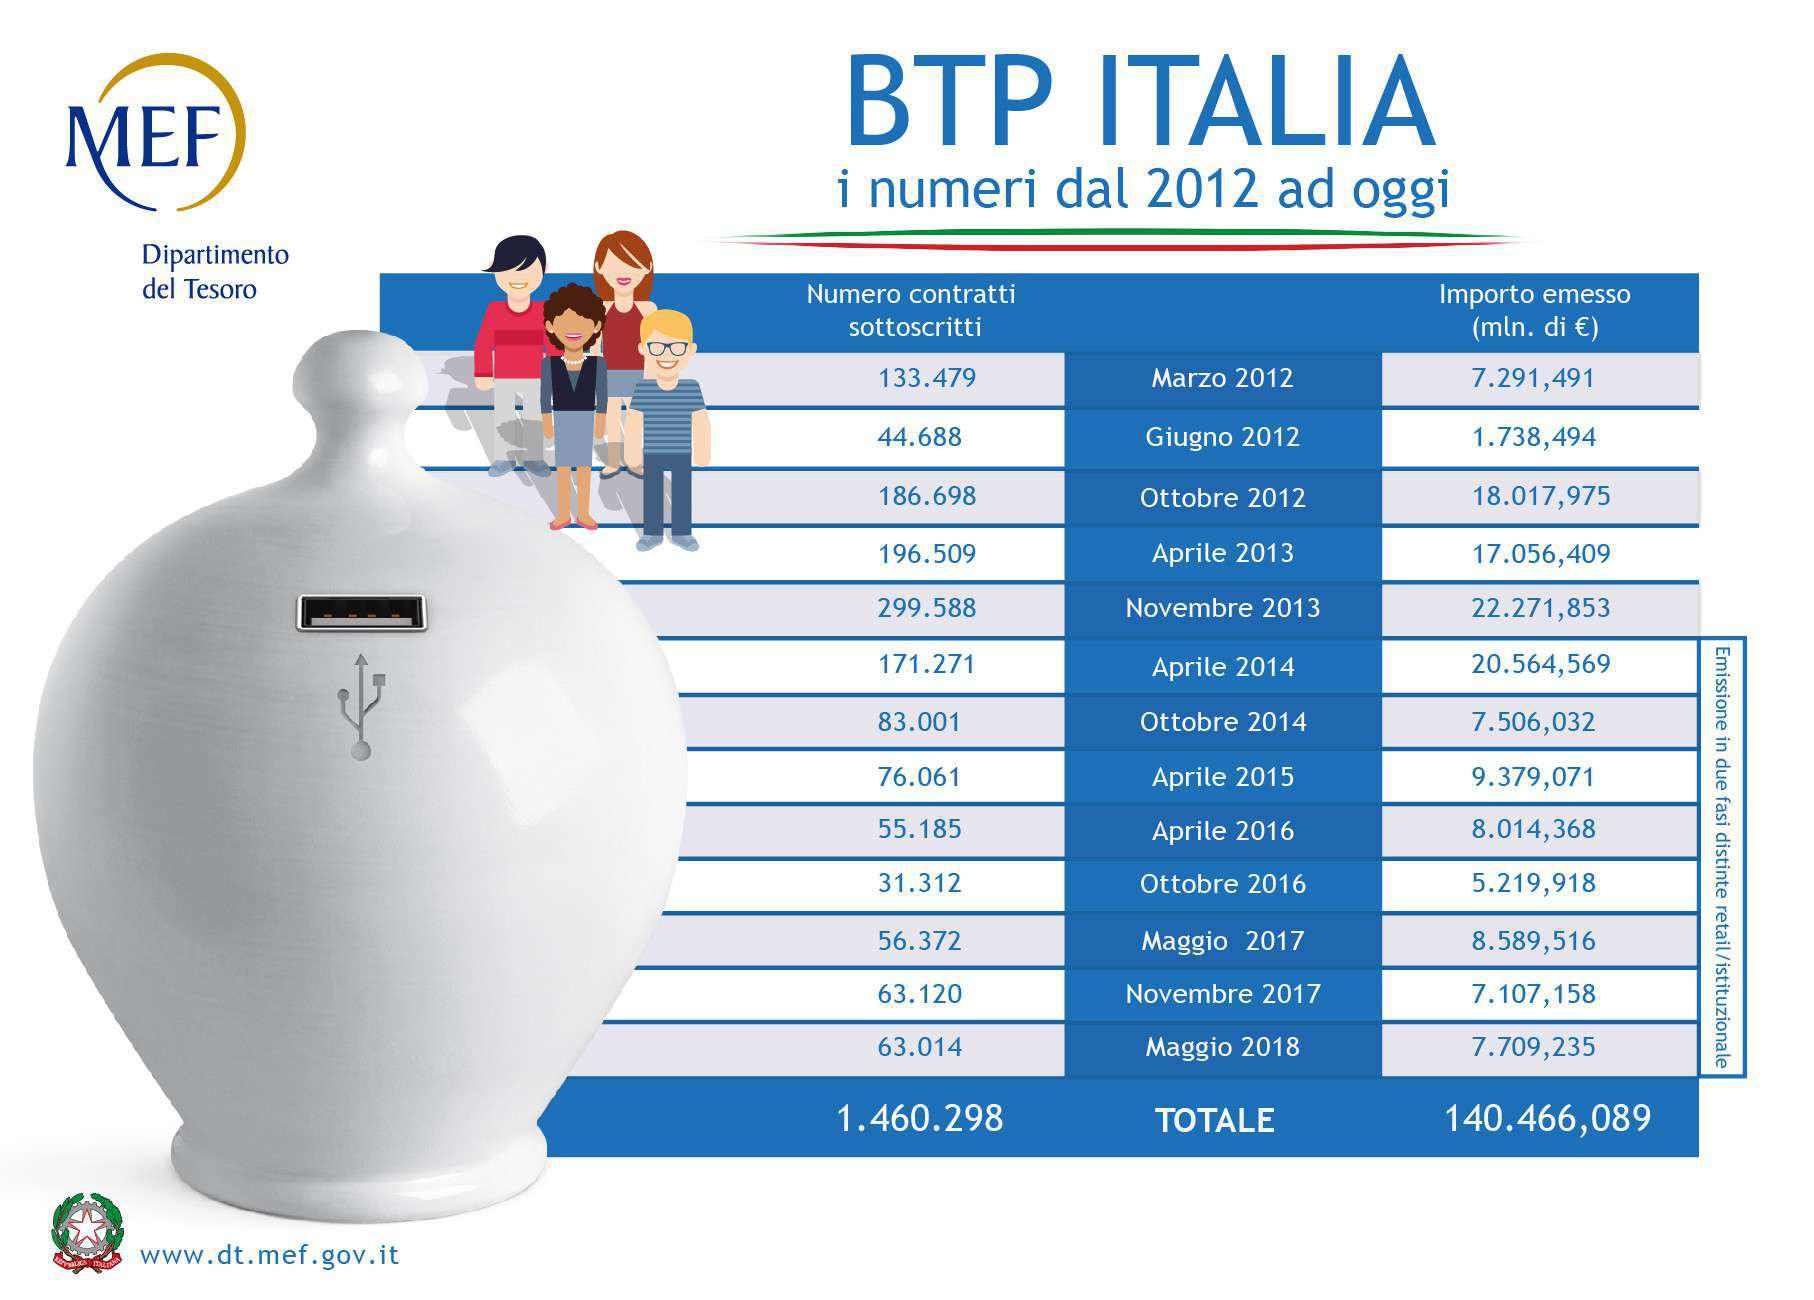 Btp Italia foto interna